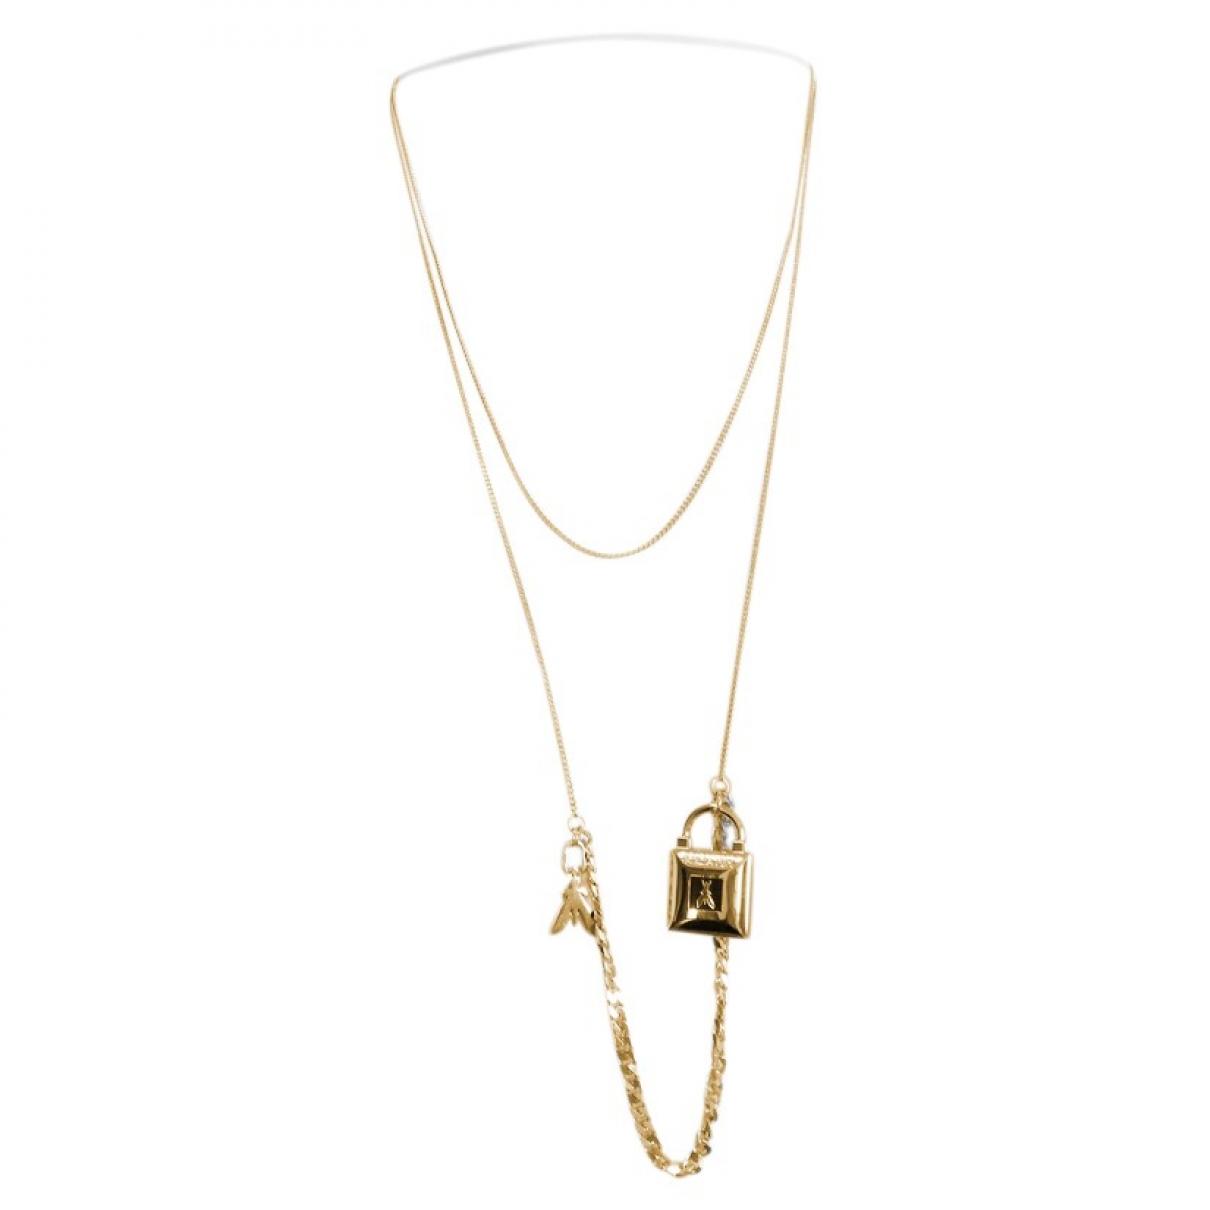 Patrizia Pepe \N Gold Metal necklace for Women \N